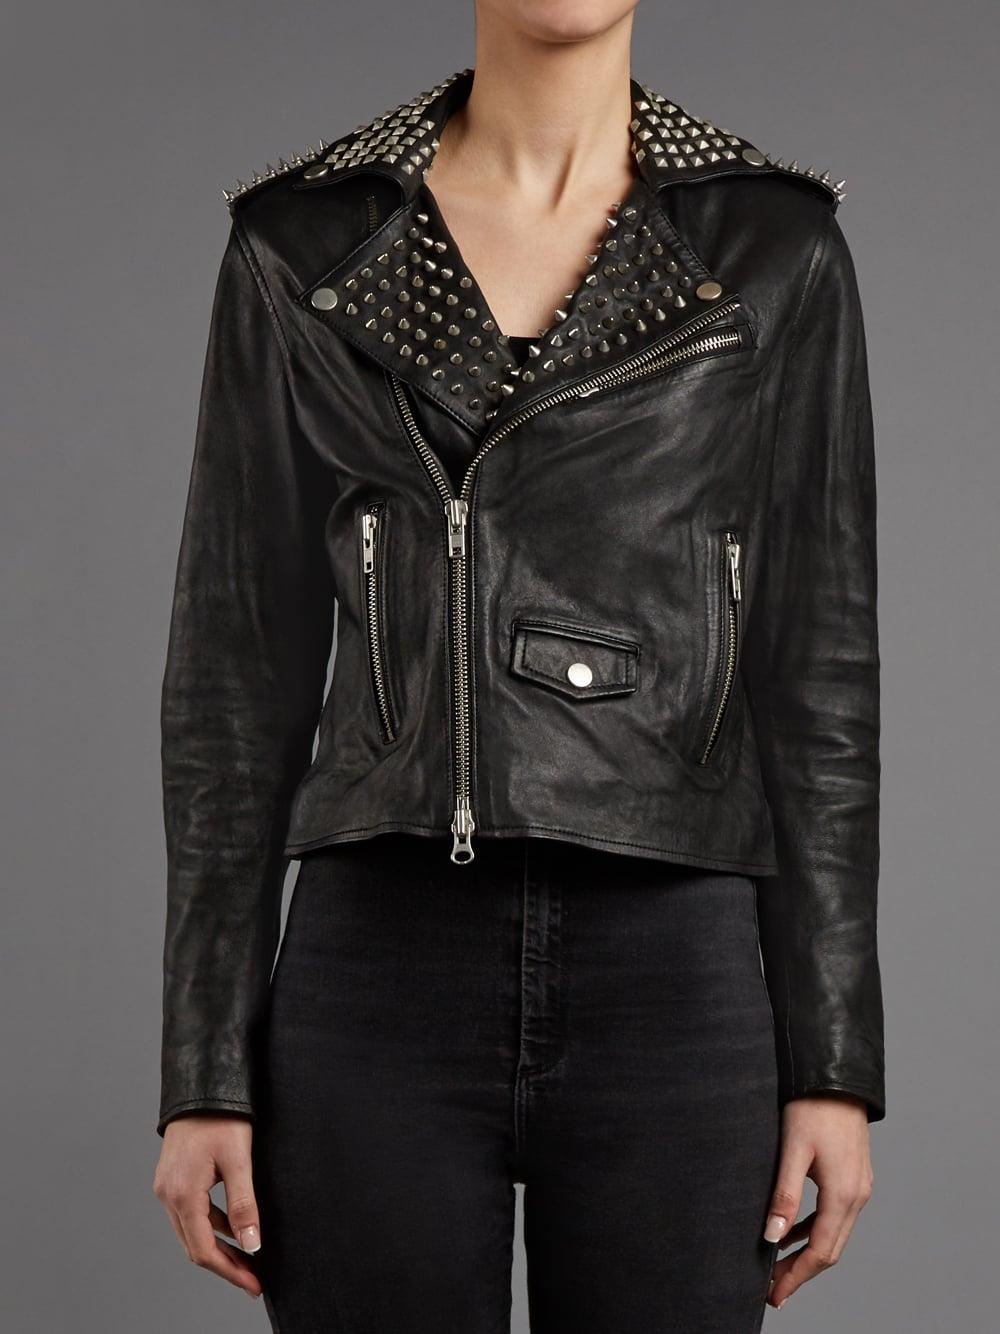 3e813ebf612f Muubaa Voisin Black Leather Studded Biker Jacket